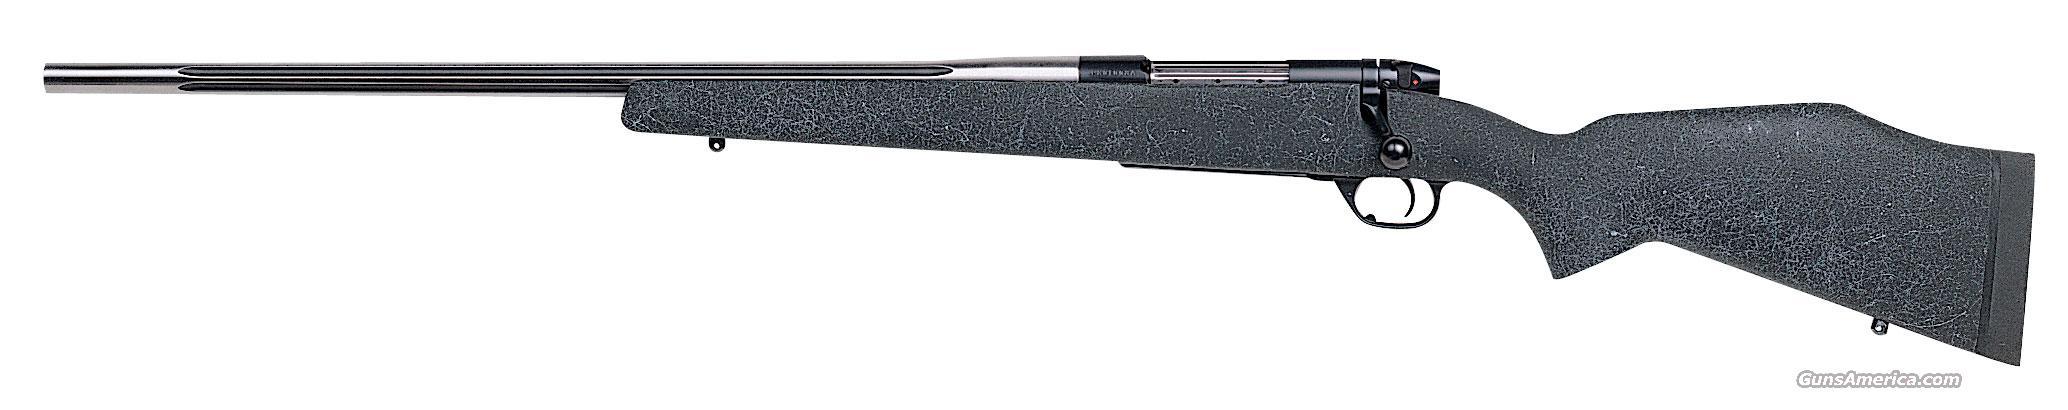 Wby MKV AccuMark LEFT HAND 257  Guns > Rifles > Weatherby Rifles